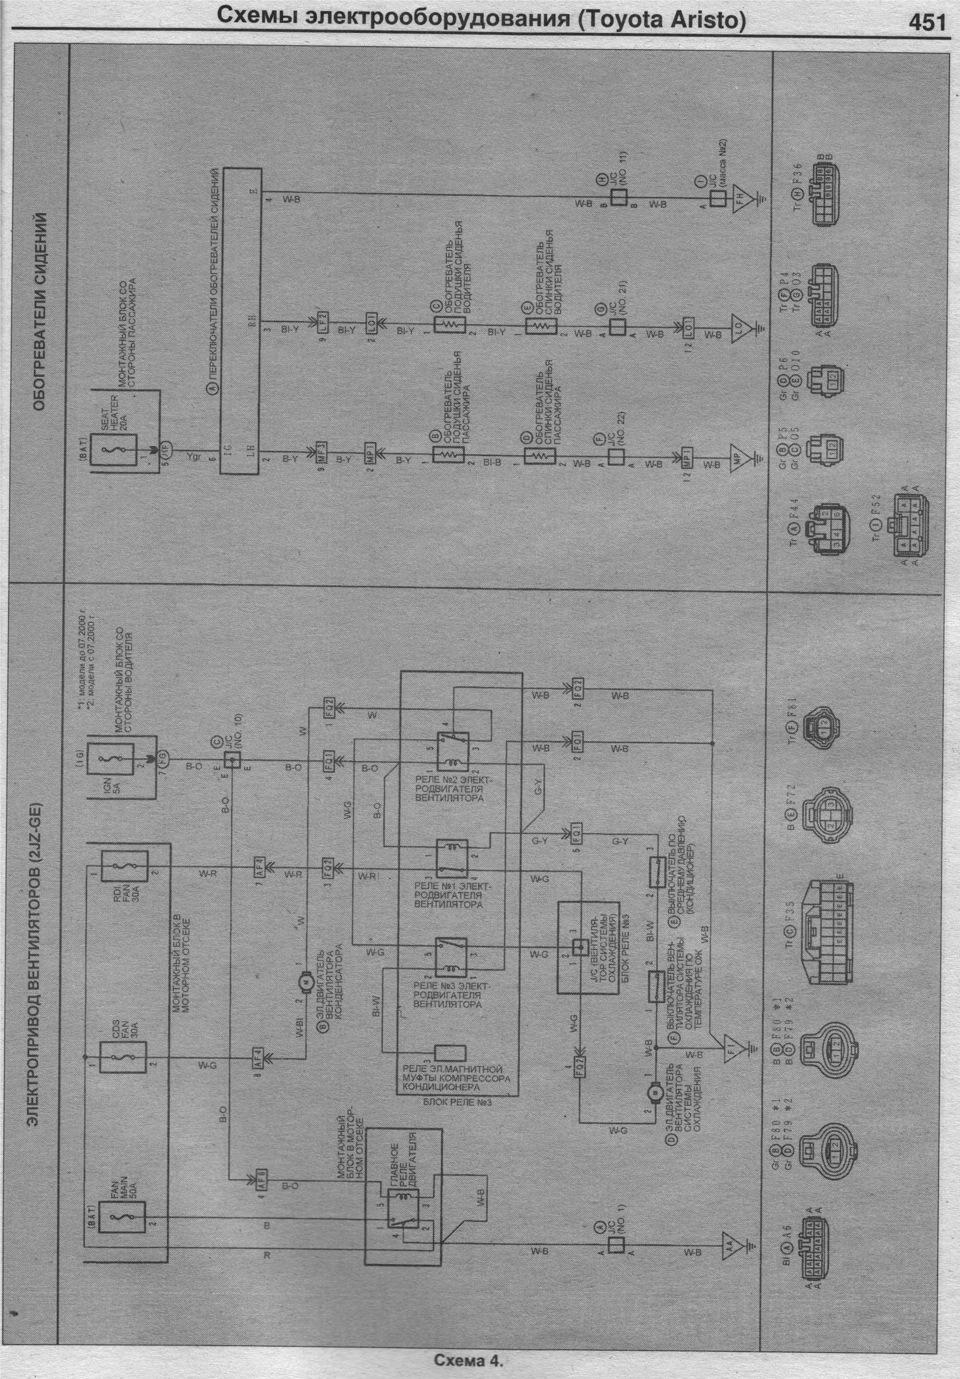 electrical equipment diagram toyota aristo 97